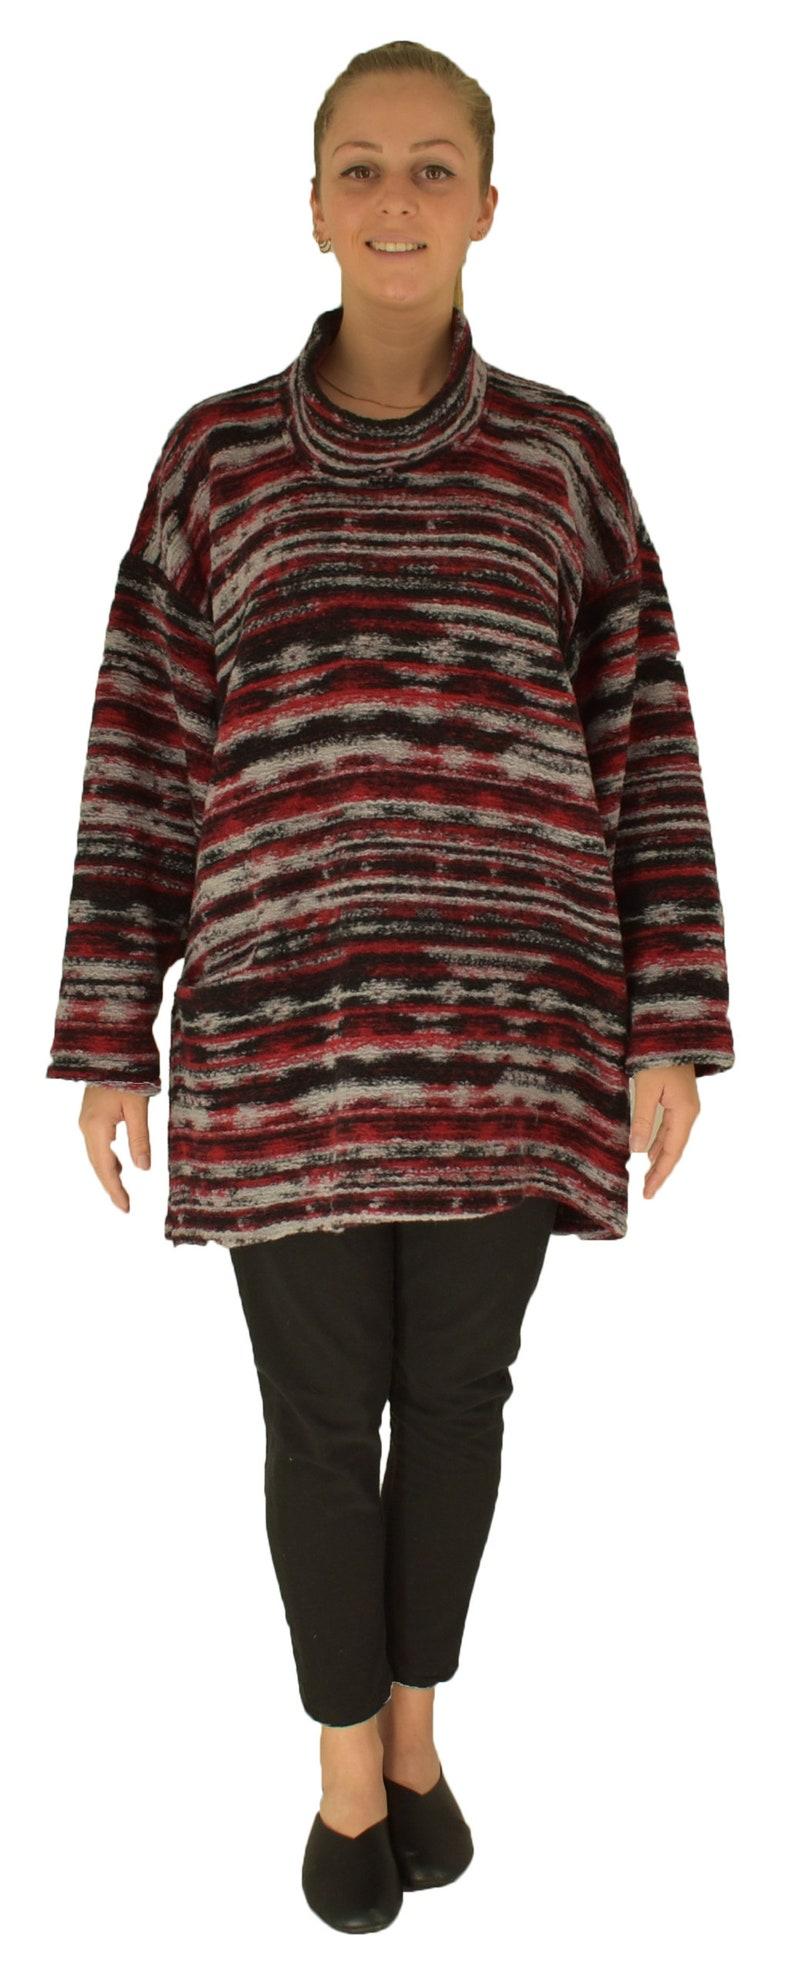 Warm Woll Sweater LJ100R Plus Size Gr 40-50 Red Black Grey Walkknit Top